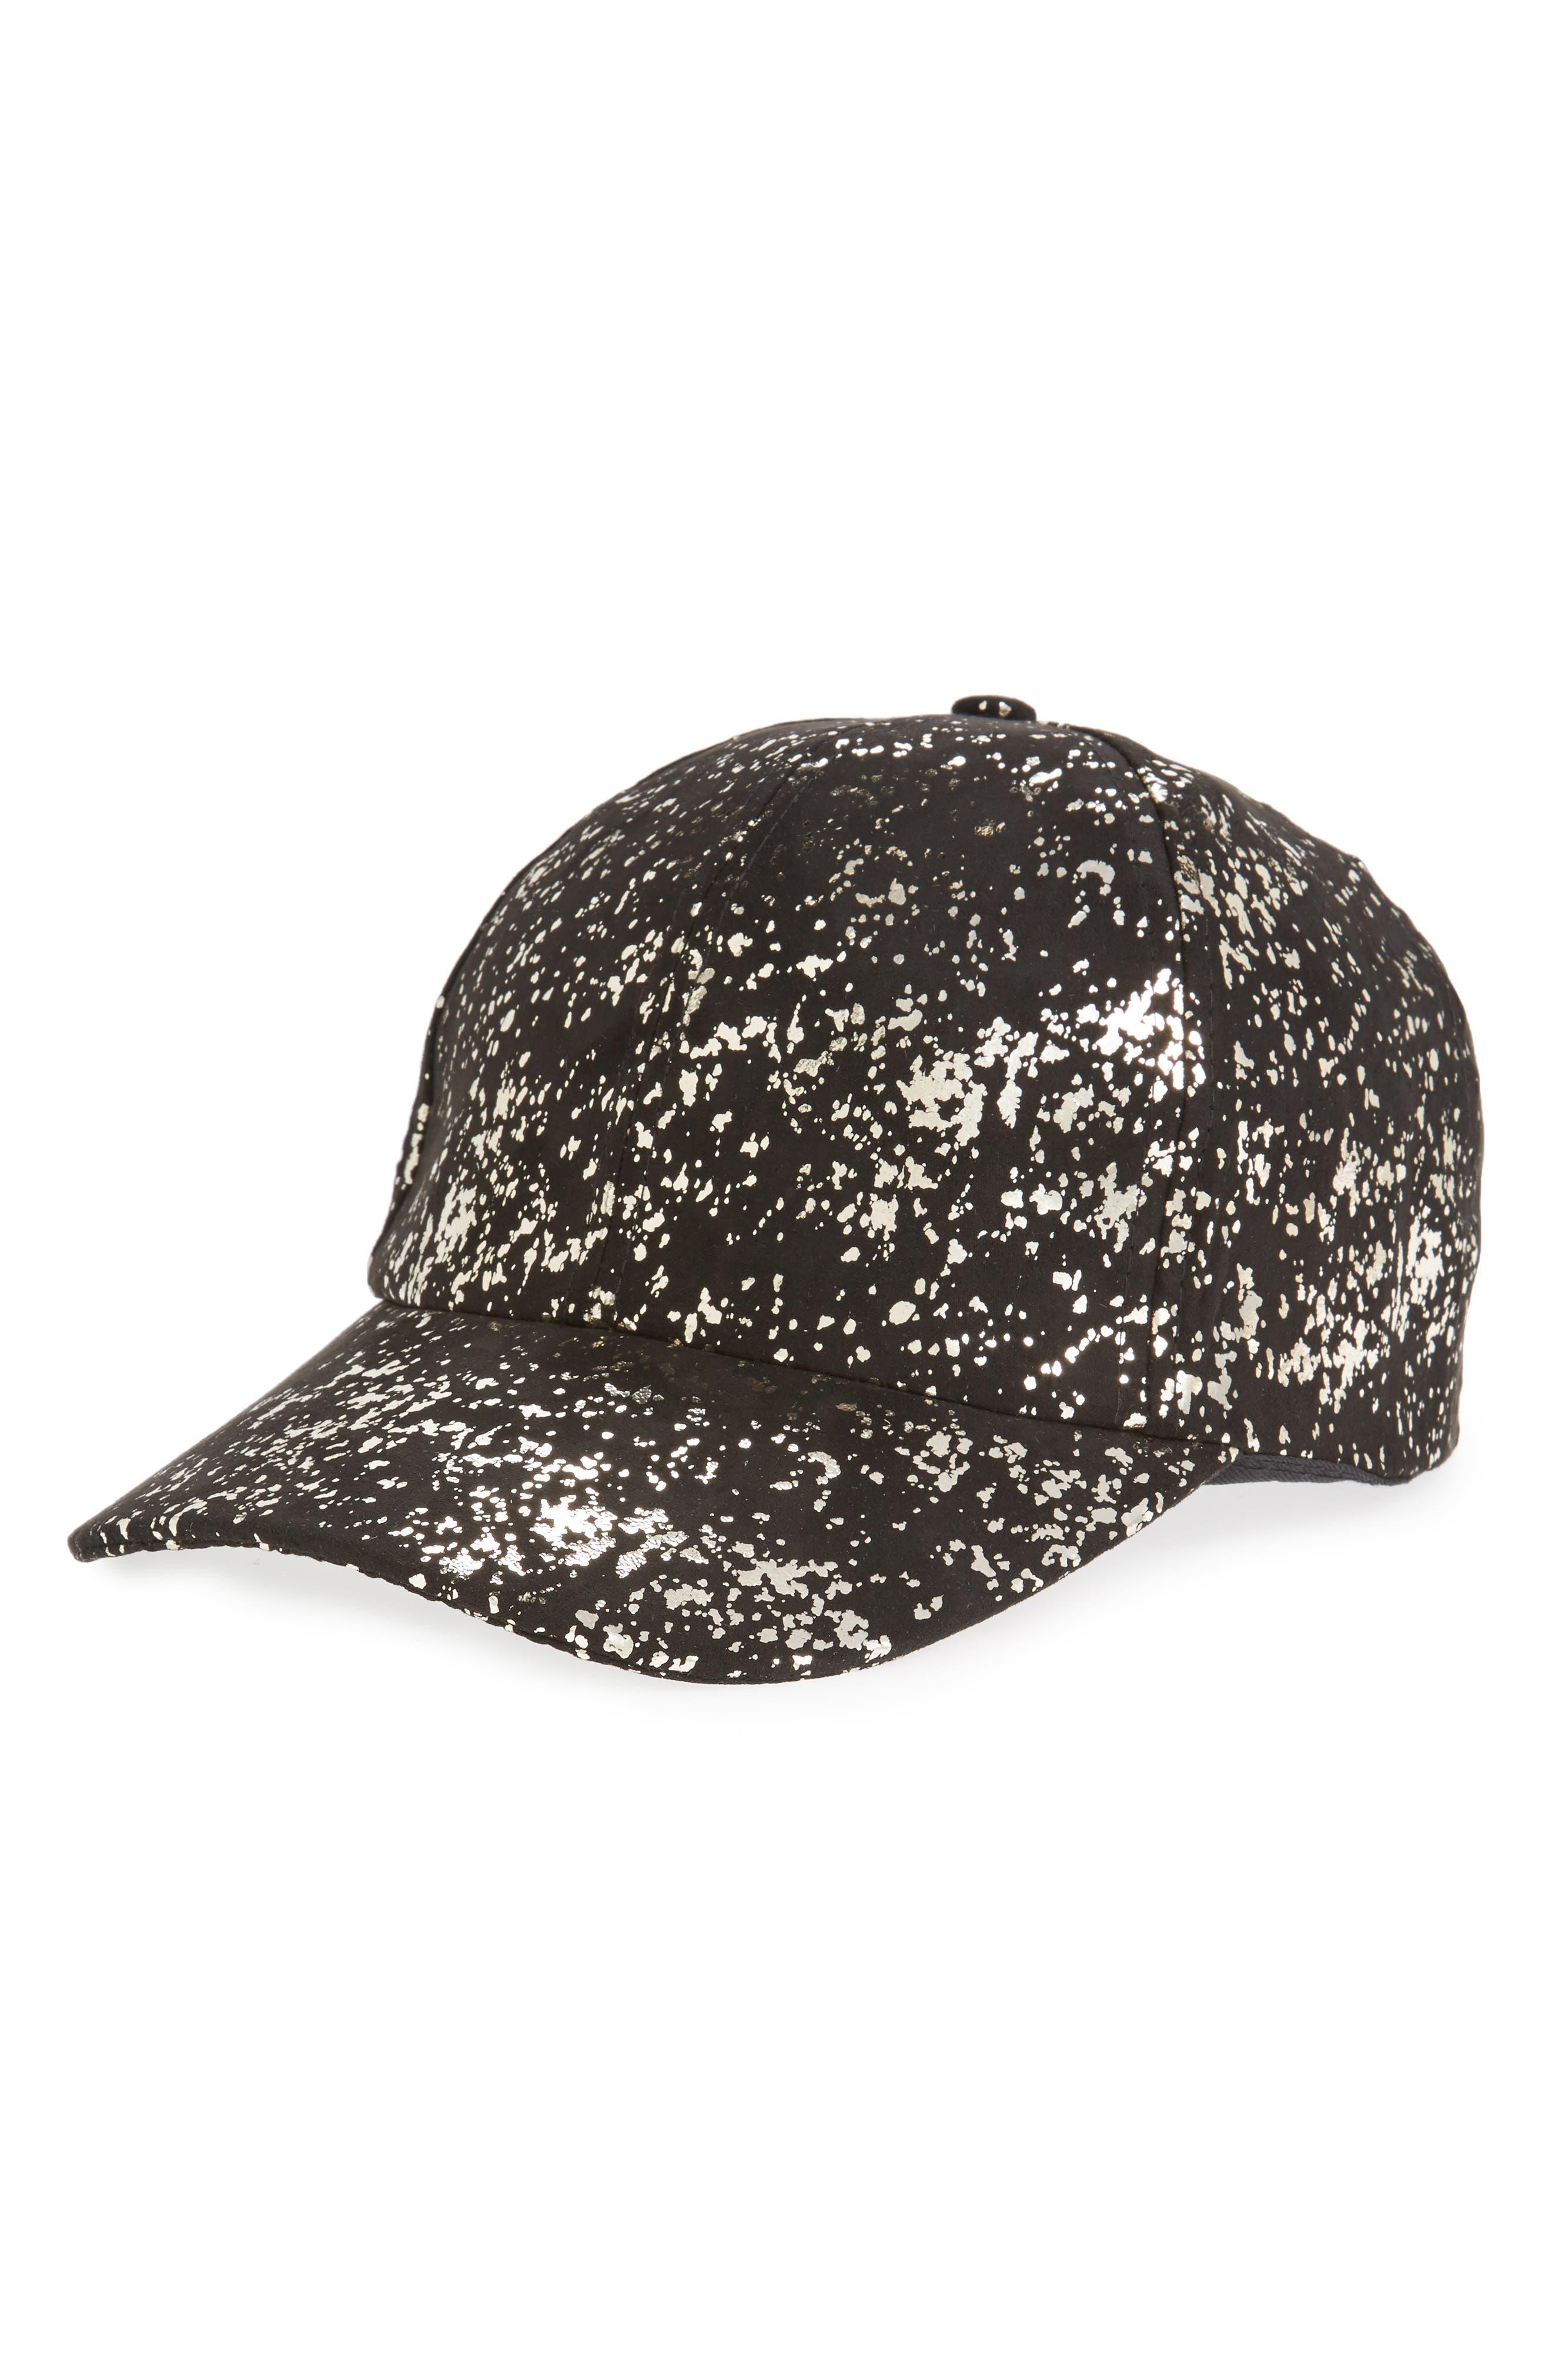 AMICI ACCESSORIES Metallic Foil Ball Cap